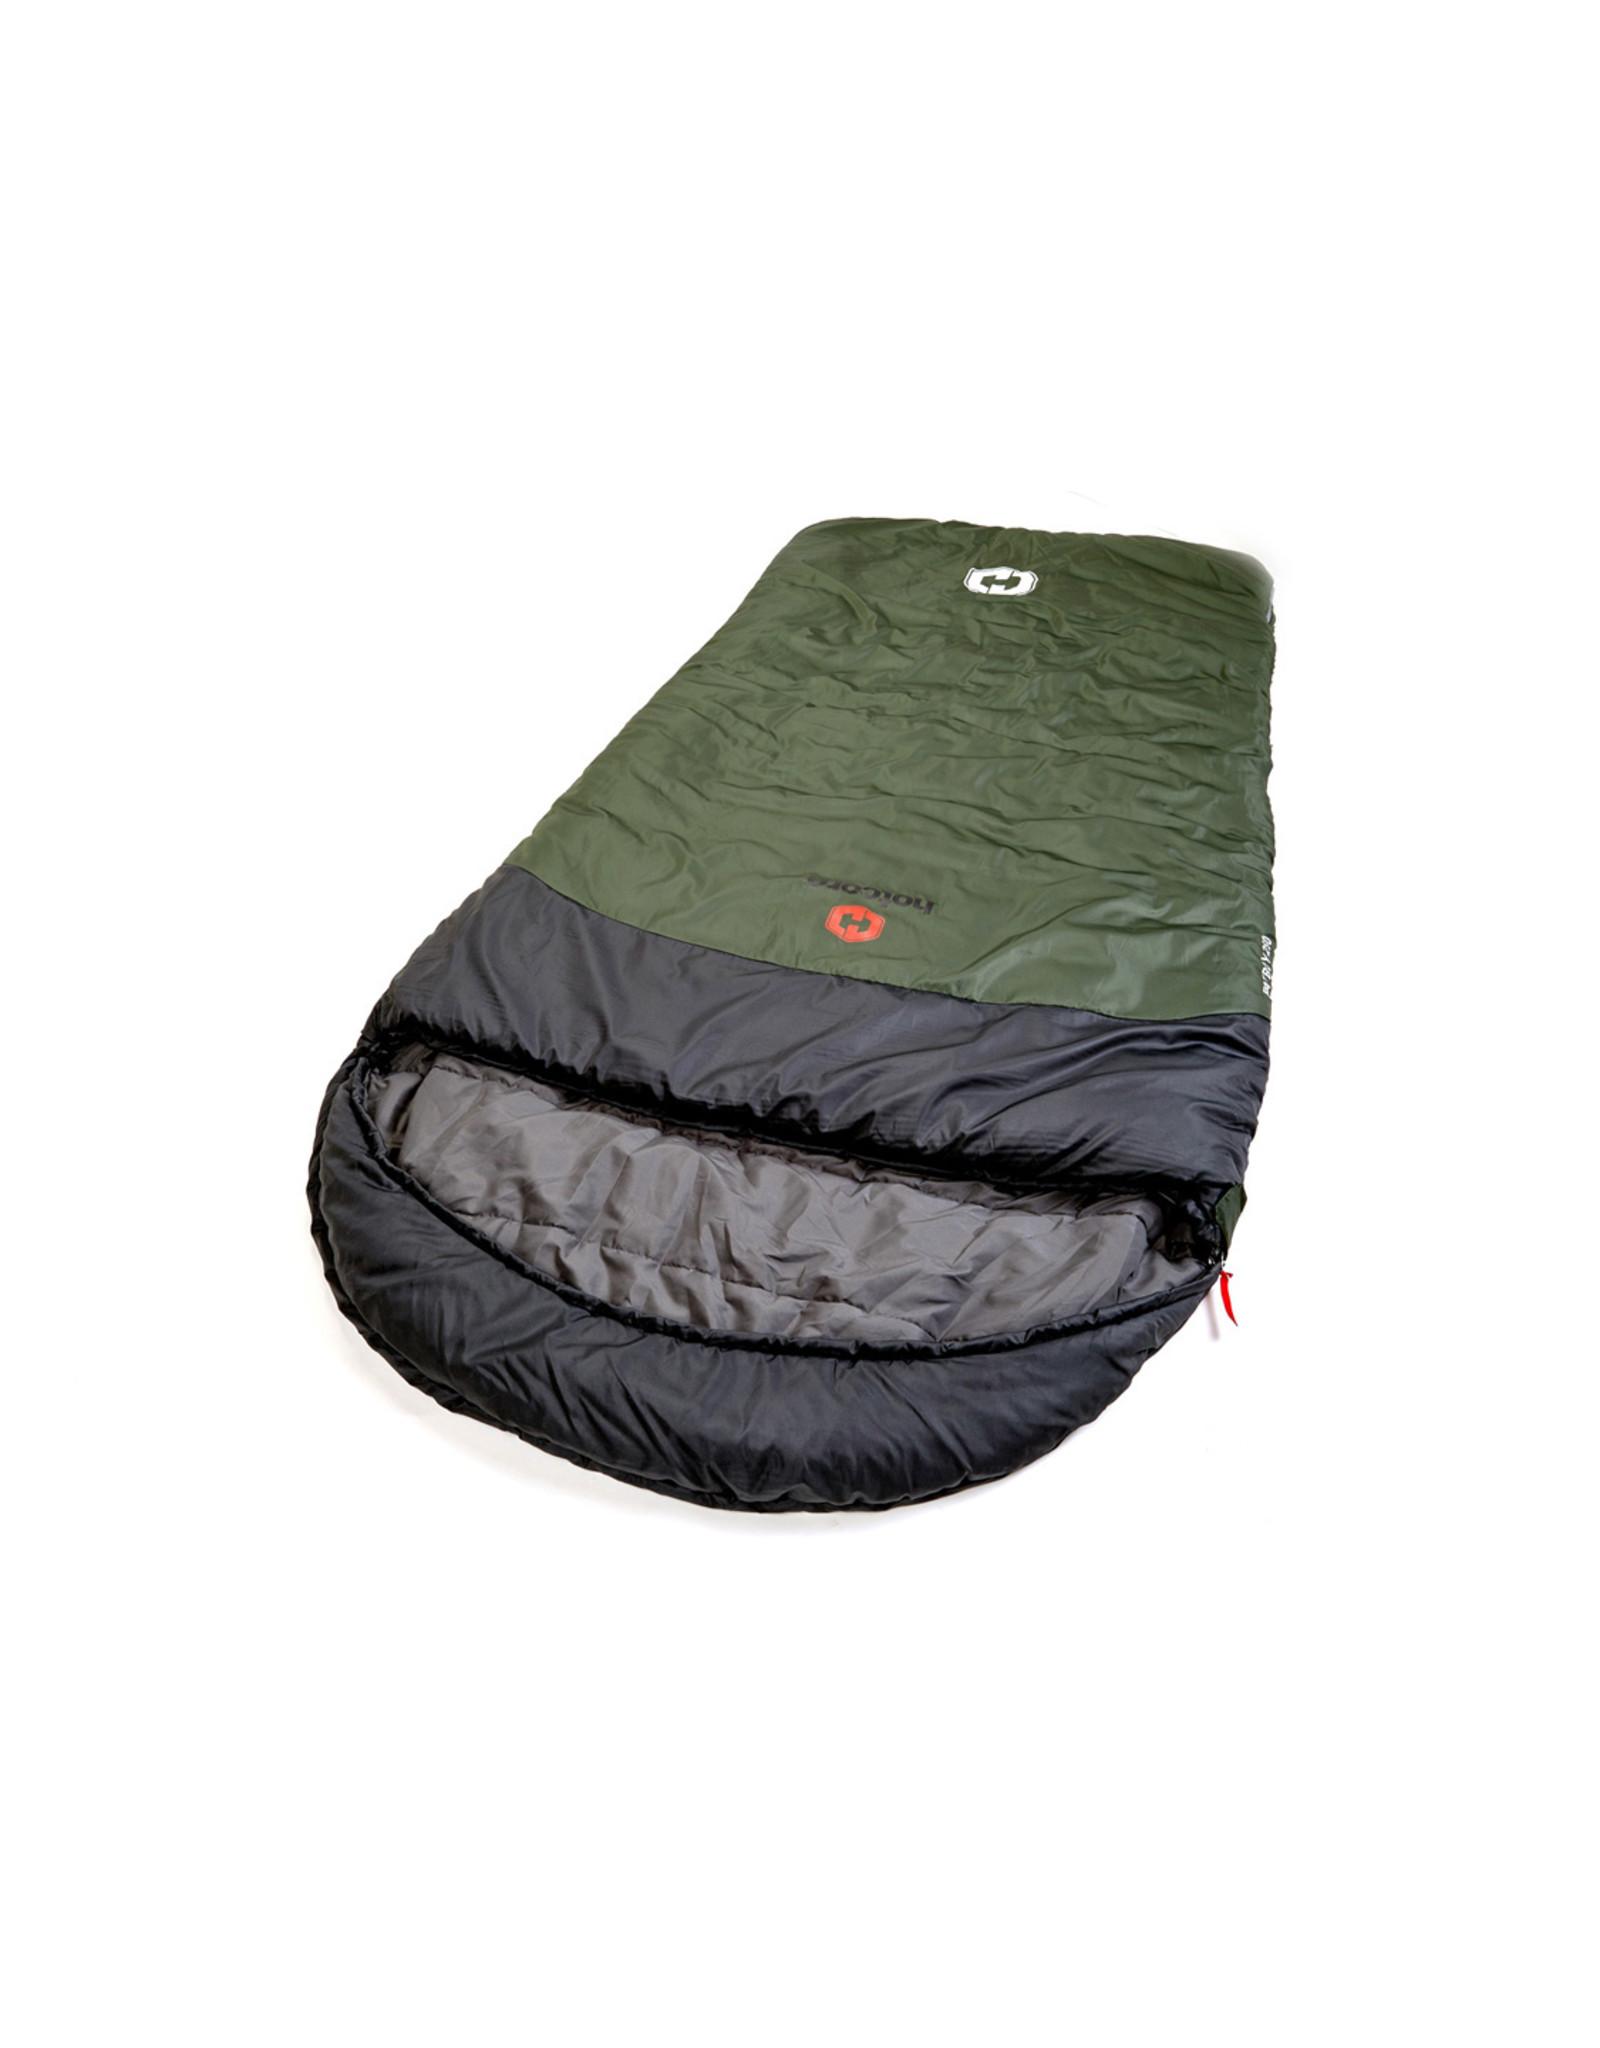 HOTCORE FATBOY 250 (-15°C) SLEEPING BAG